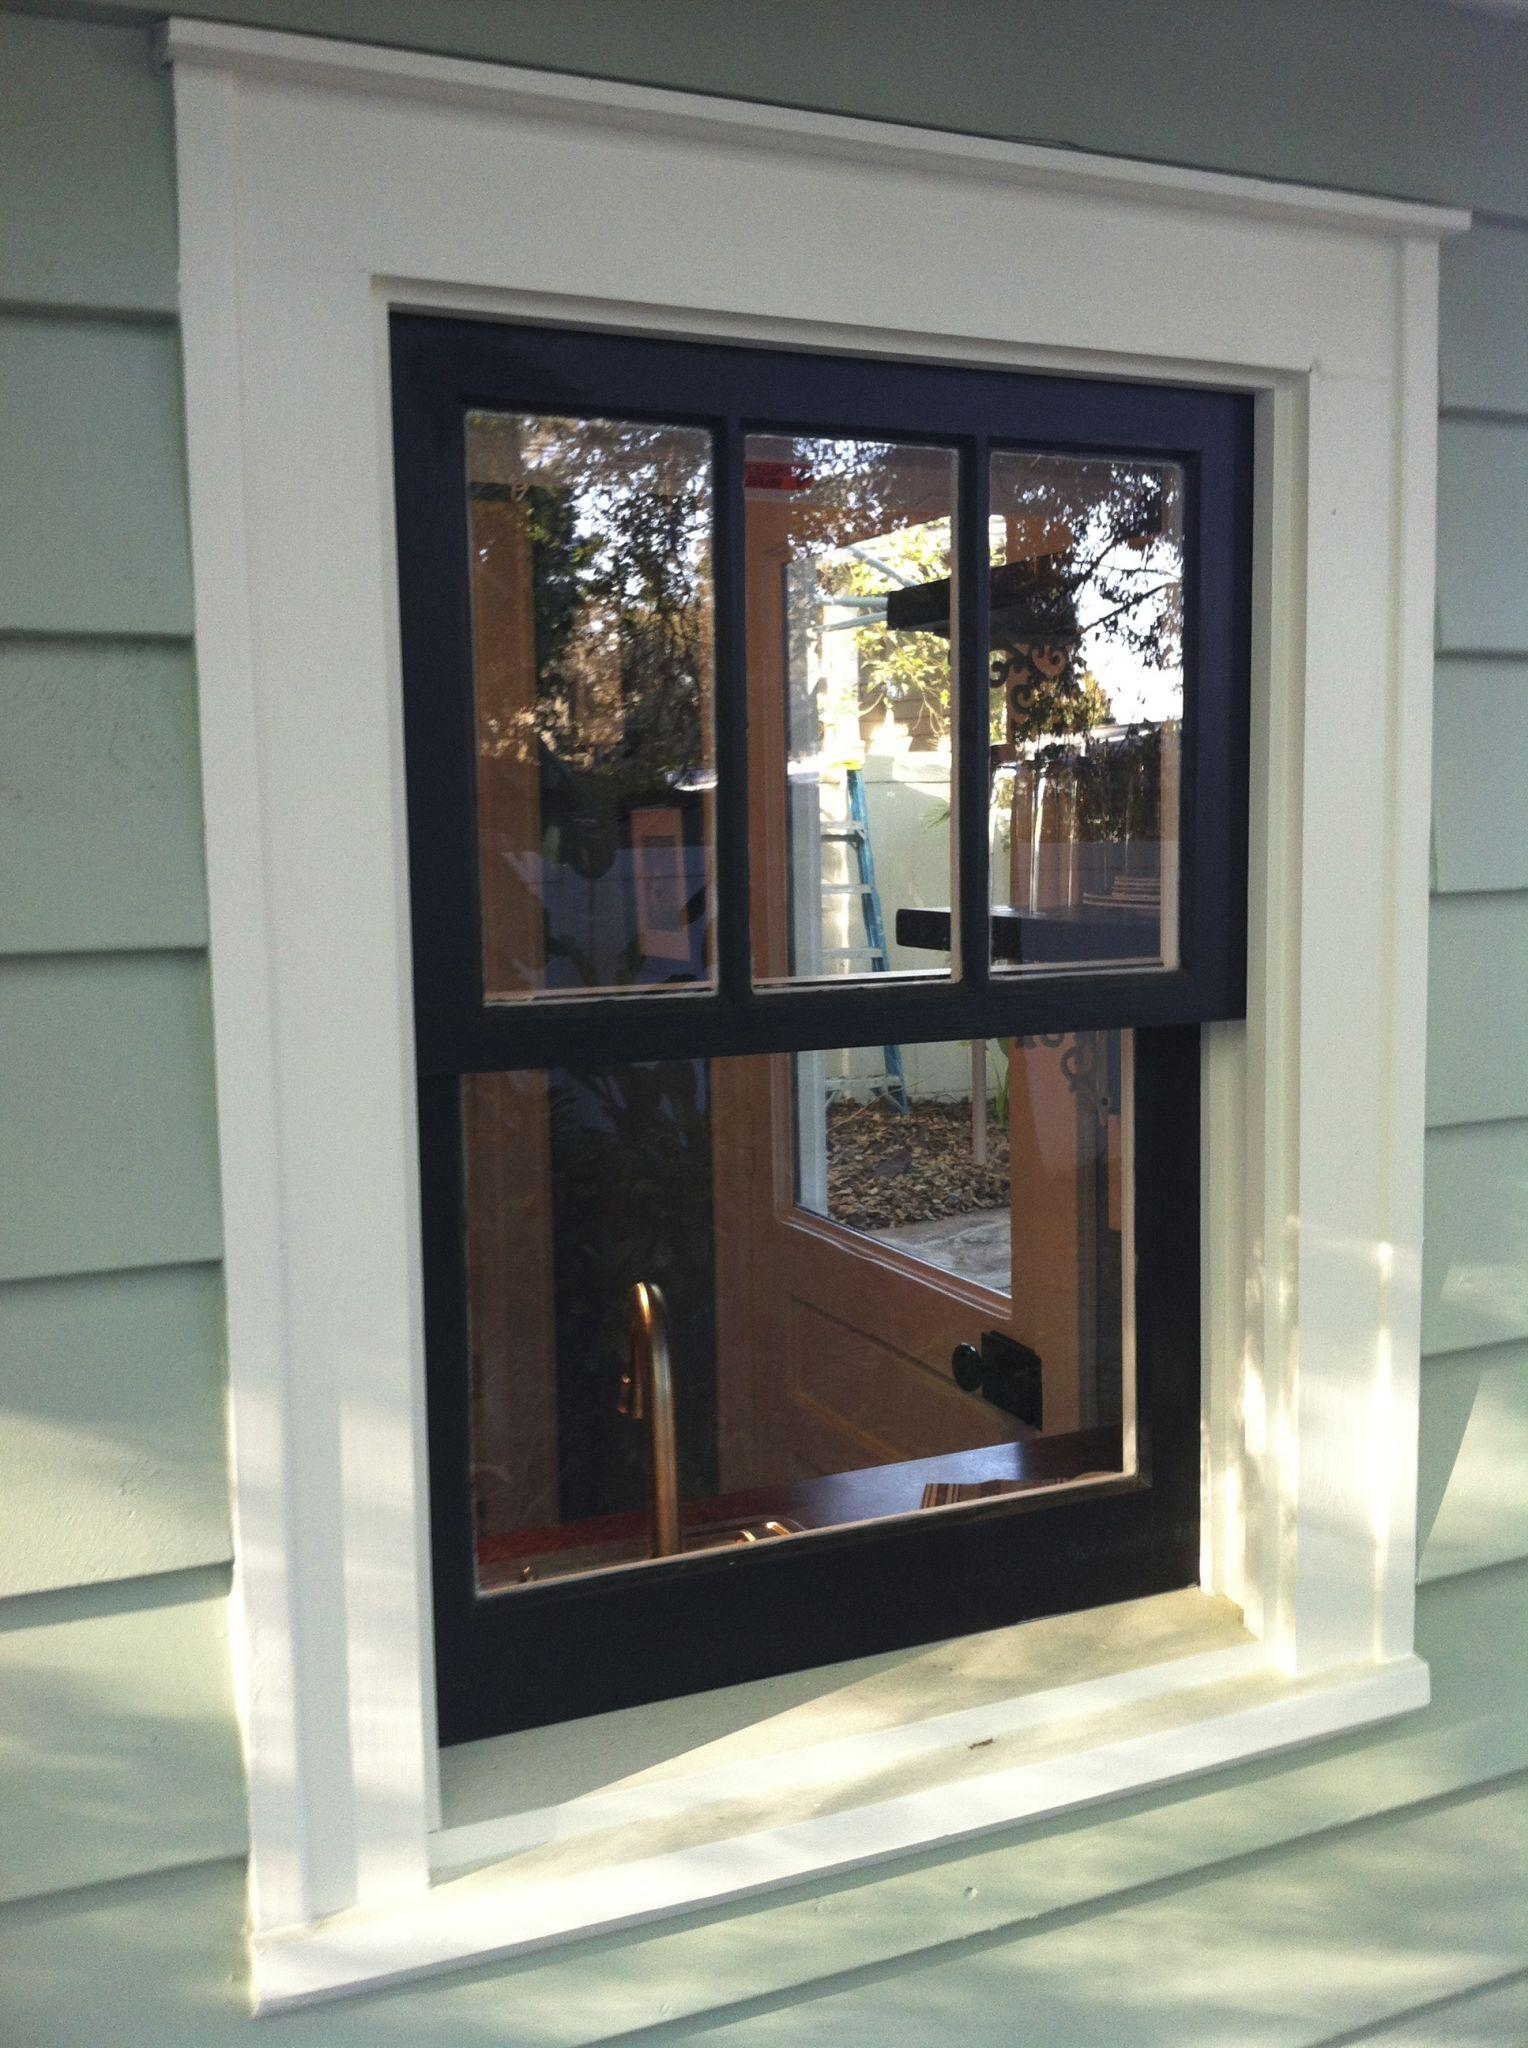 Uncategorized exterior residential windows - How To Repair Restore Old Windows